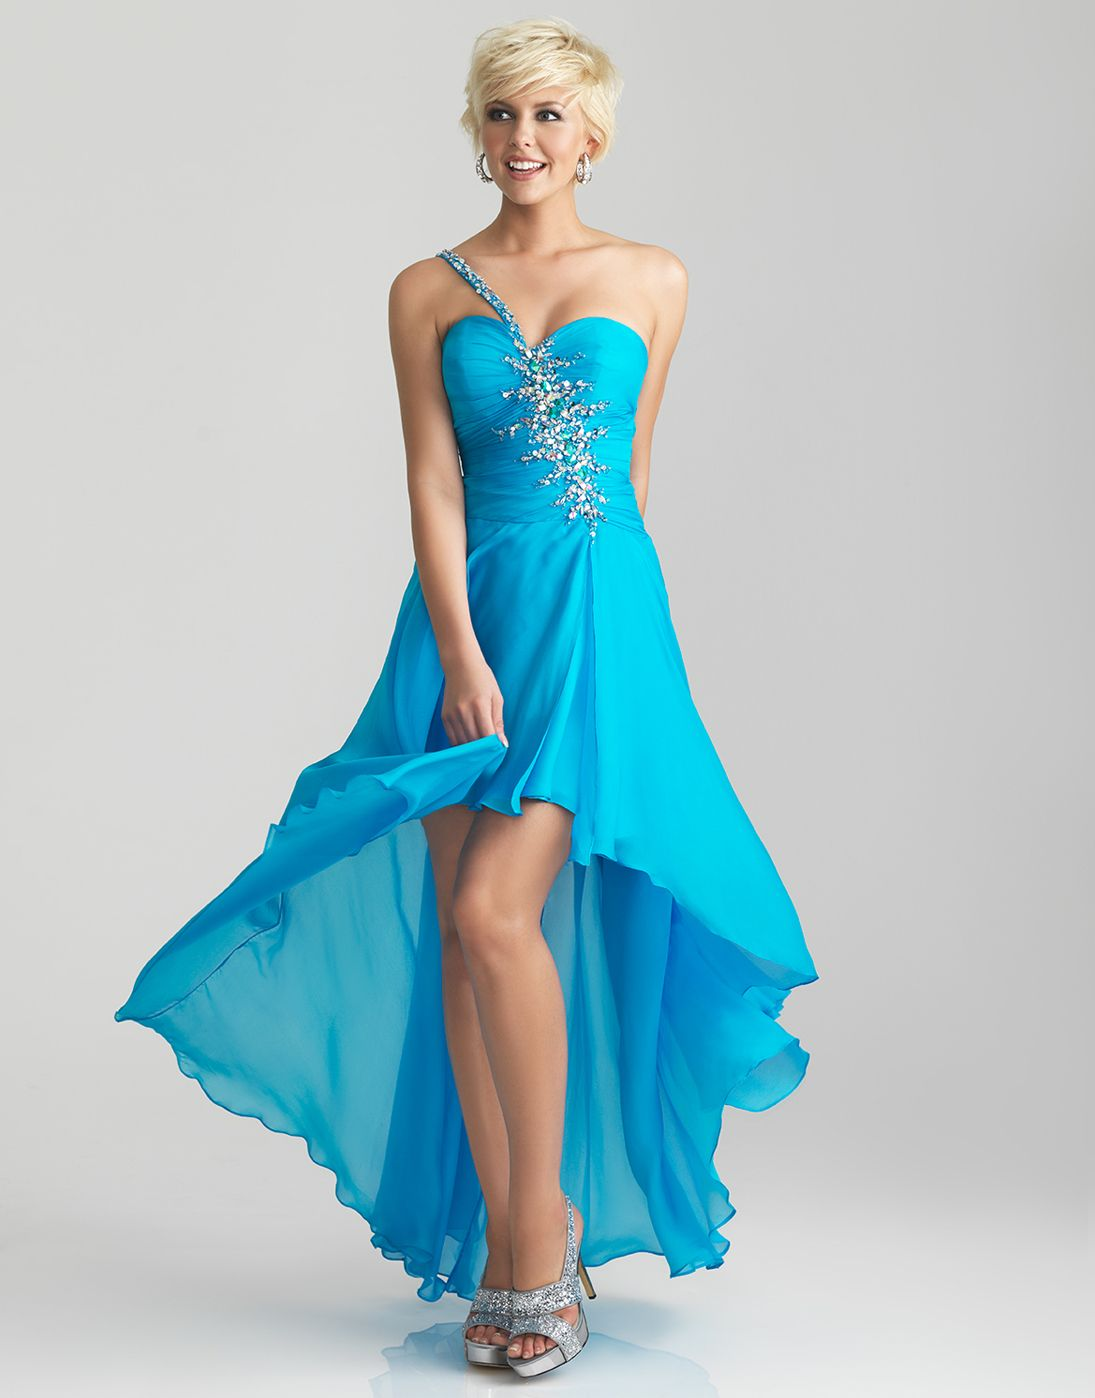 Unique Vintage | Turquoise bridesmaid dresses, Turquoise and ...